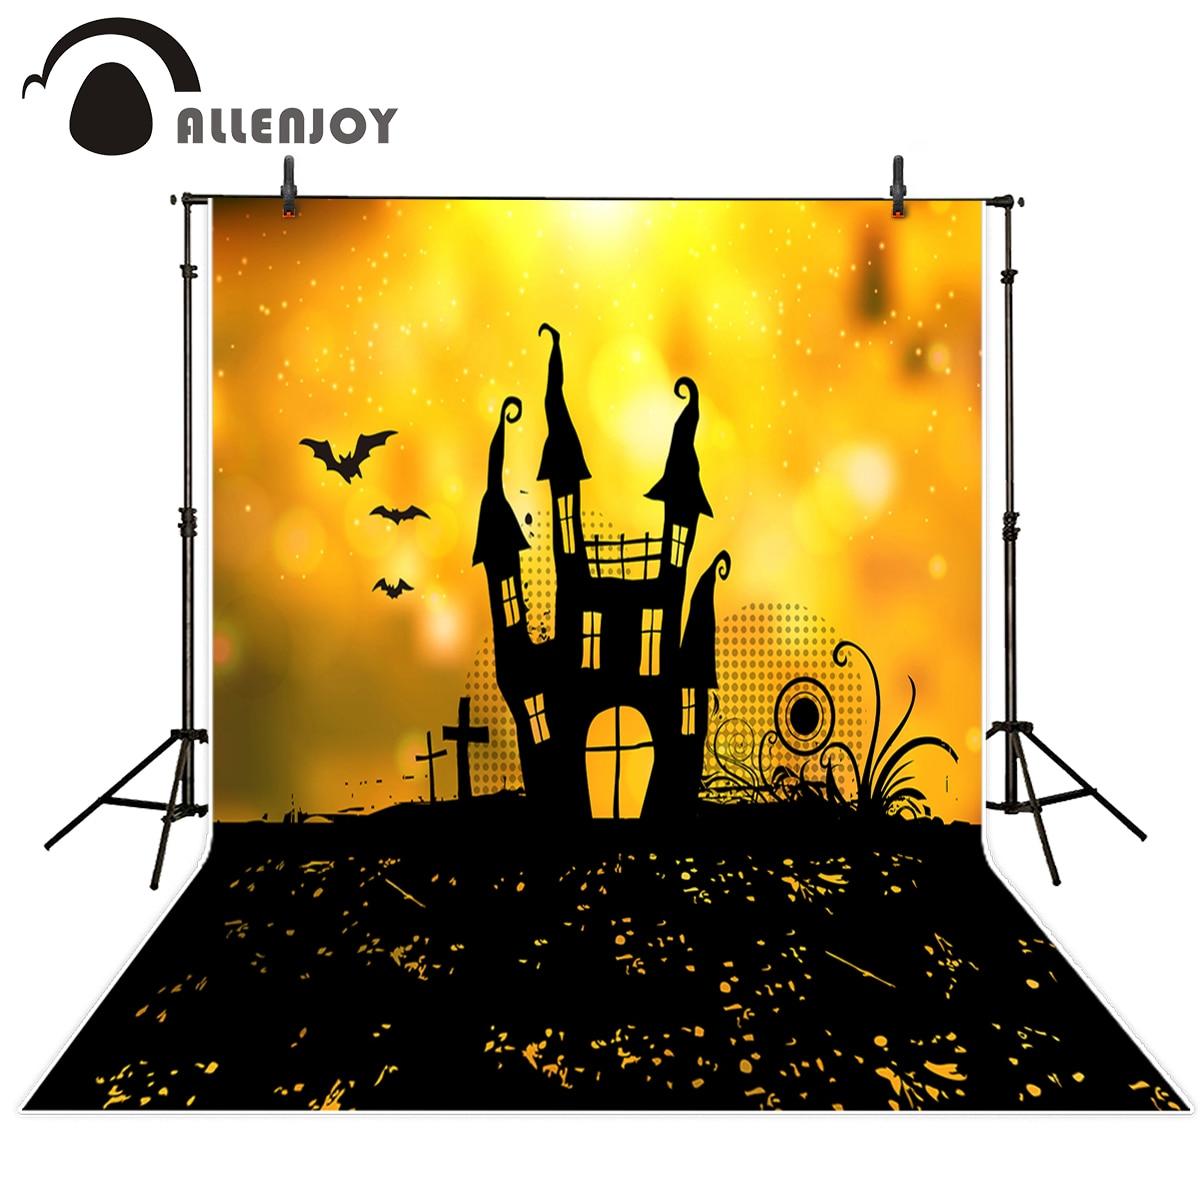 Allenjoy photography background glitter castle bat cross Halloween theme backdrop professional photo background studio